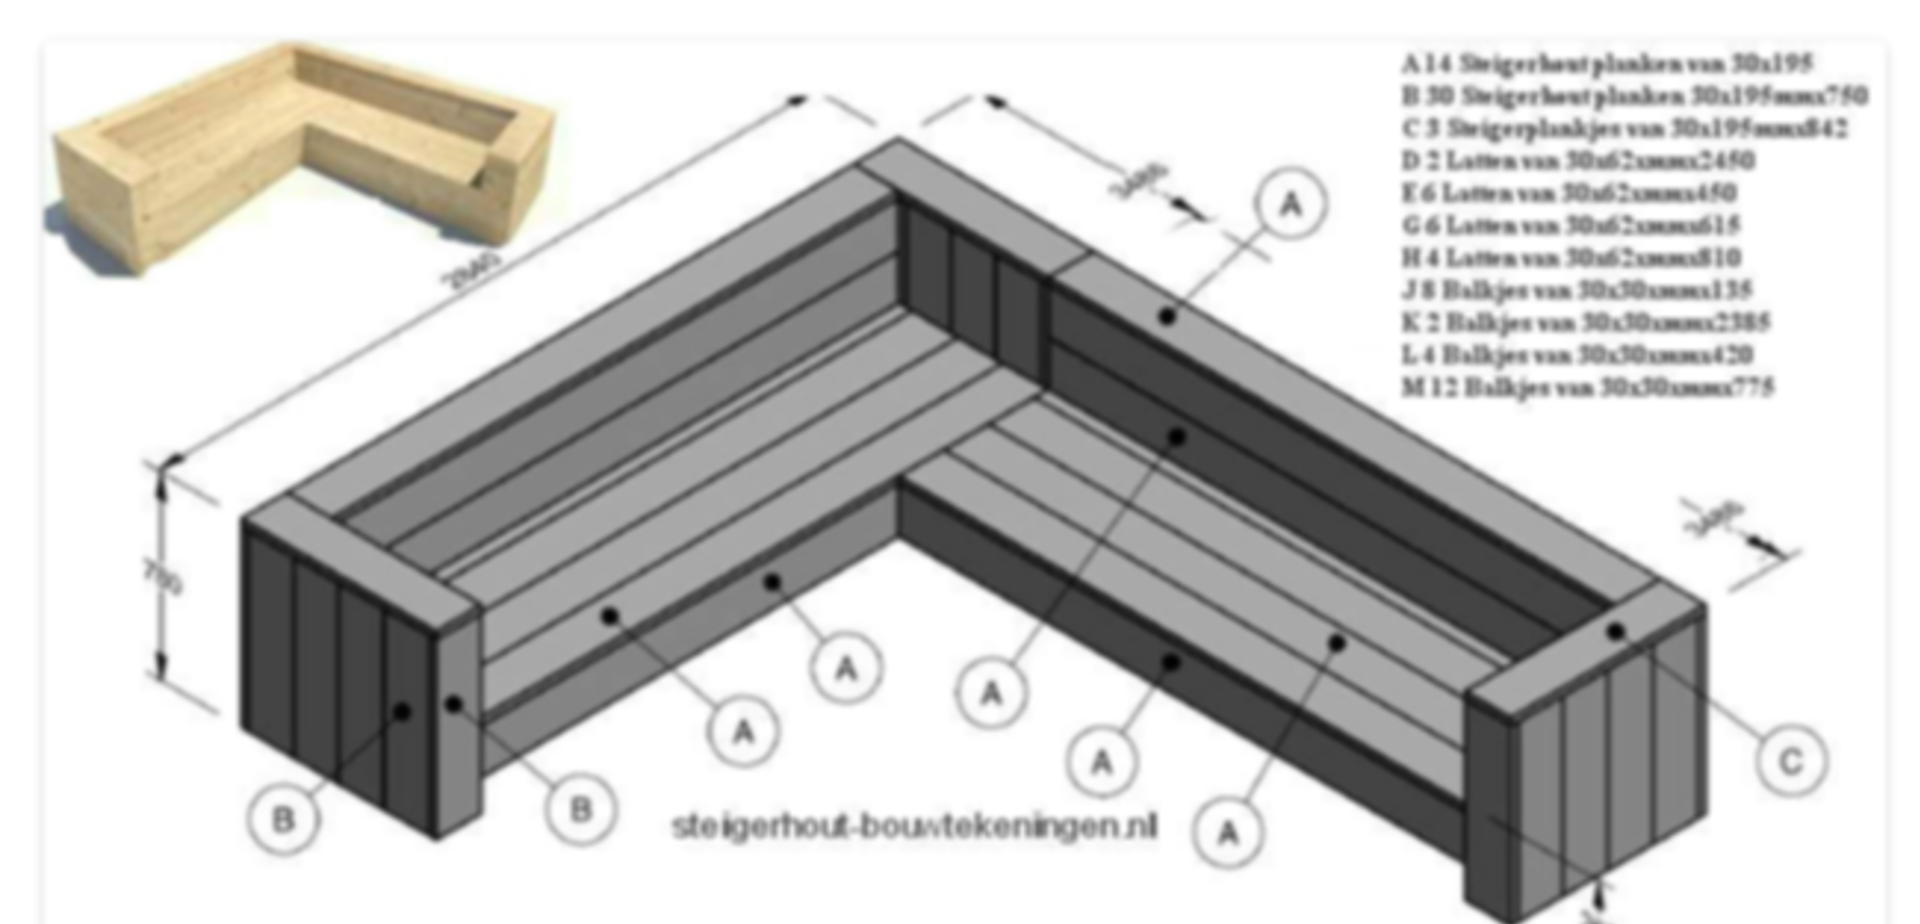 Afmetingen Tuinbank Steigerhout.Hoekbank Steigerhout Voordemakers Nl